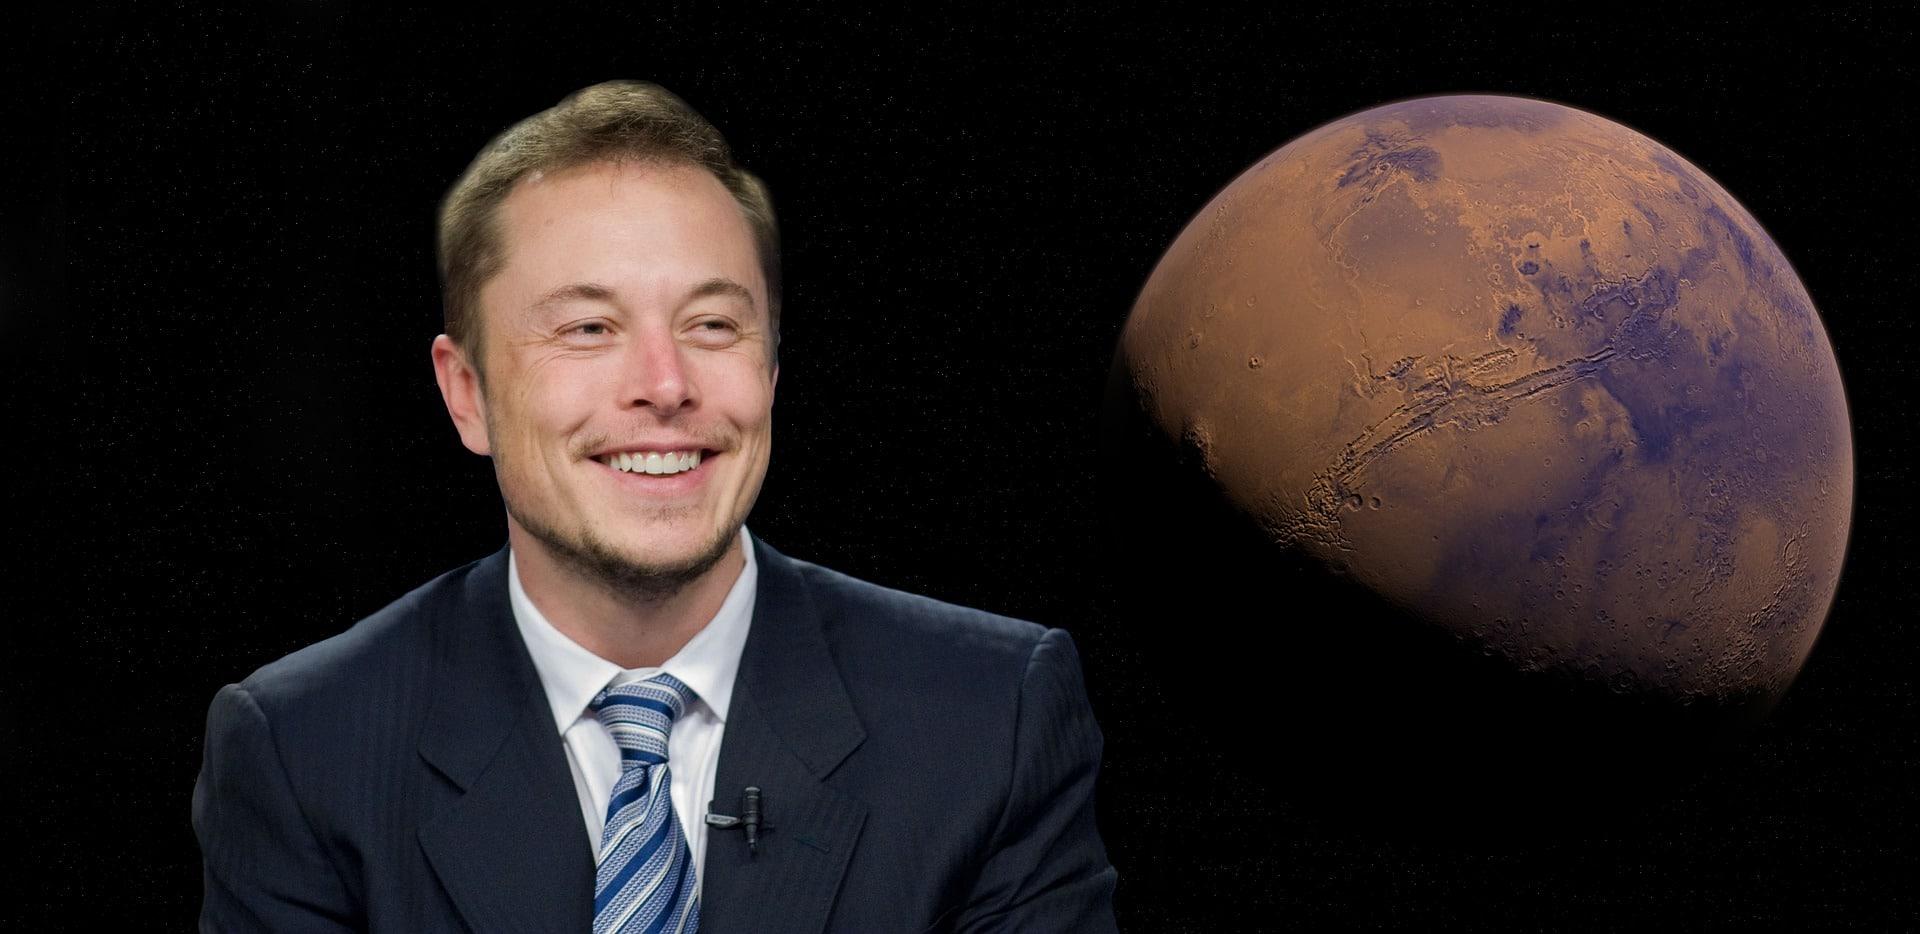 Elon Musk videogame